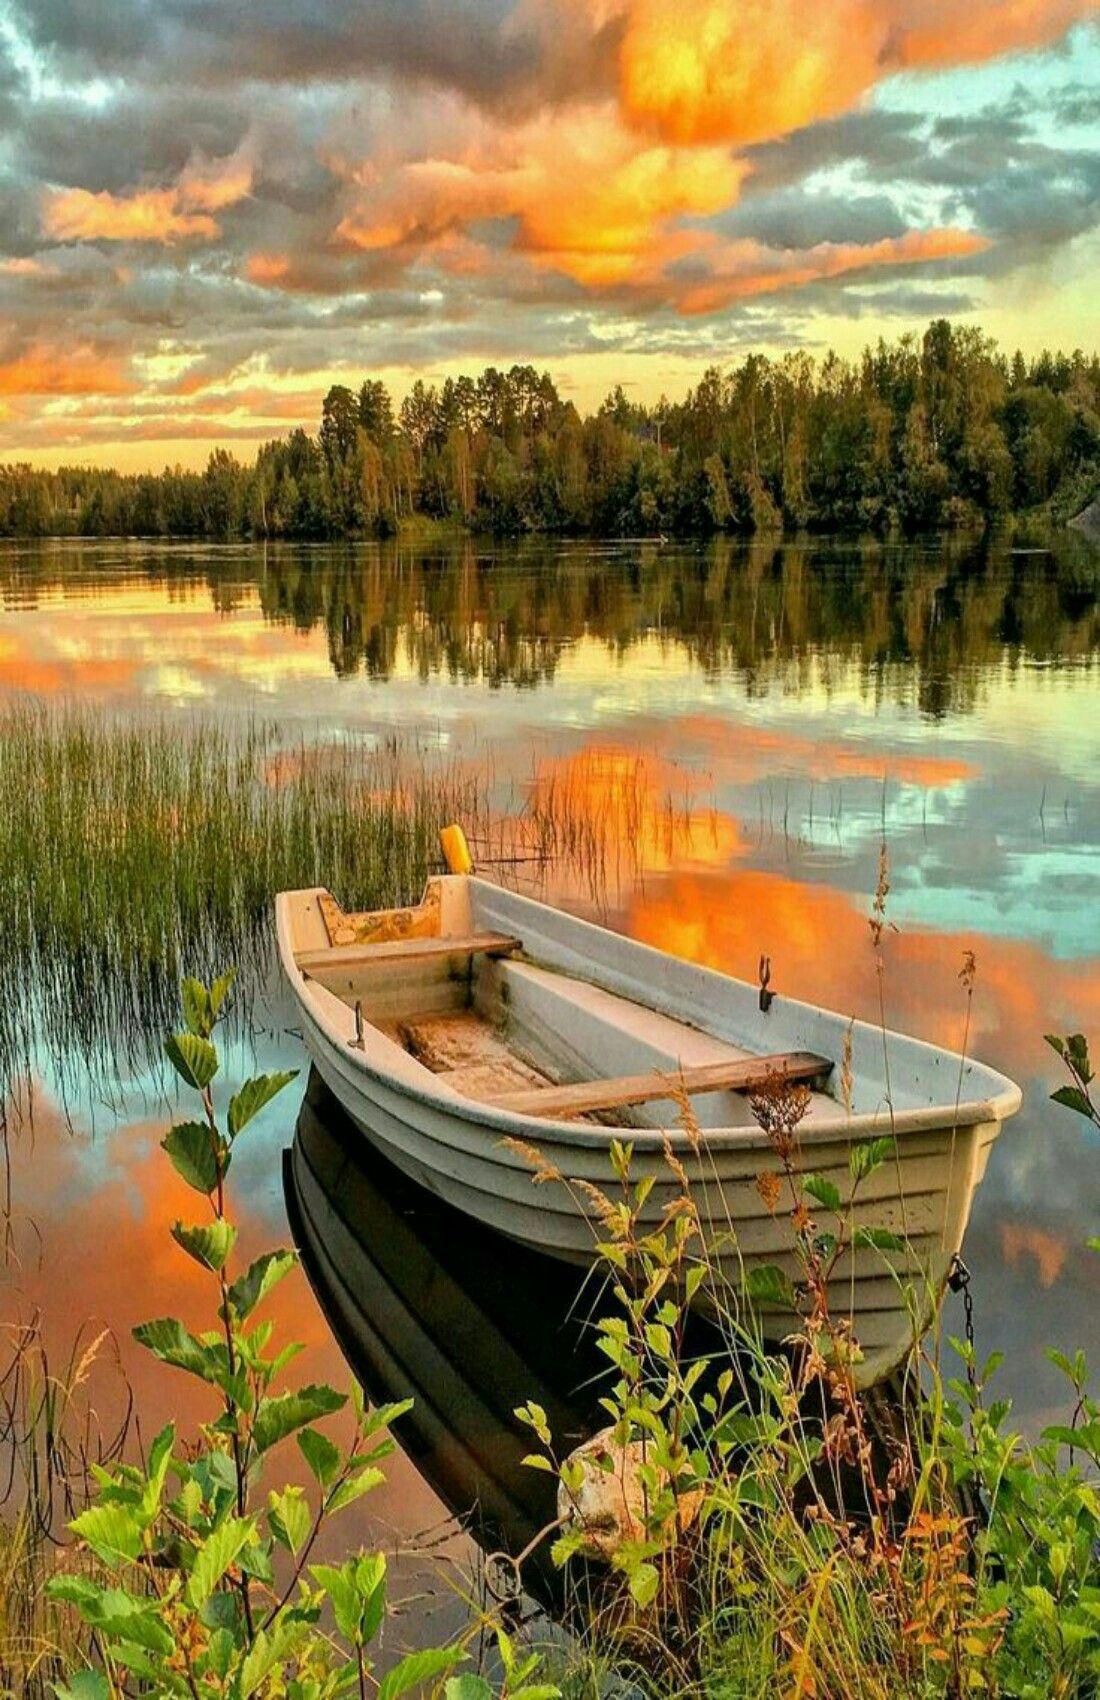 Naturbilder: schöne #Naturbilder #Natur #Boot #Himmel # ...